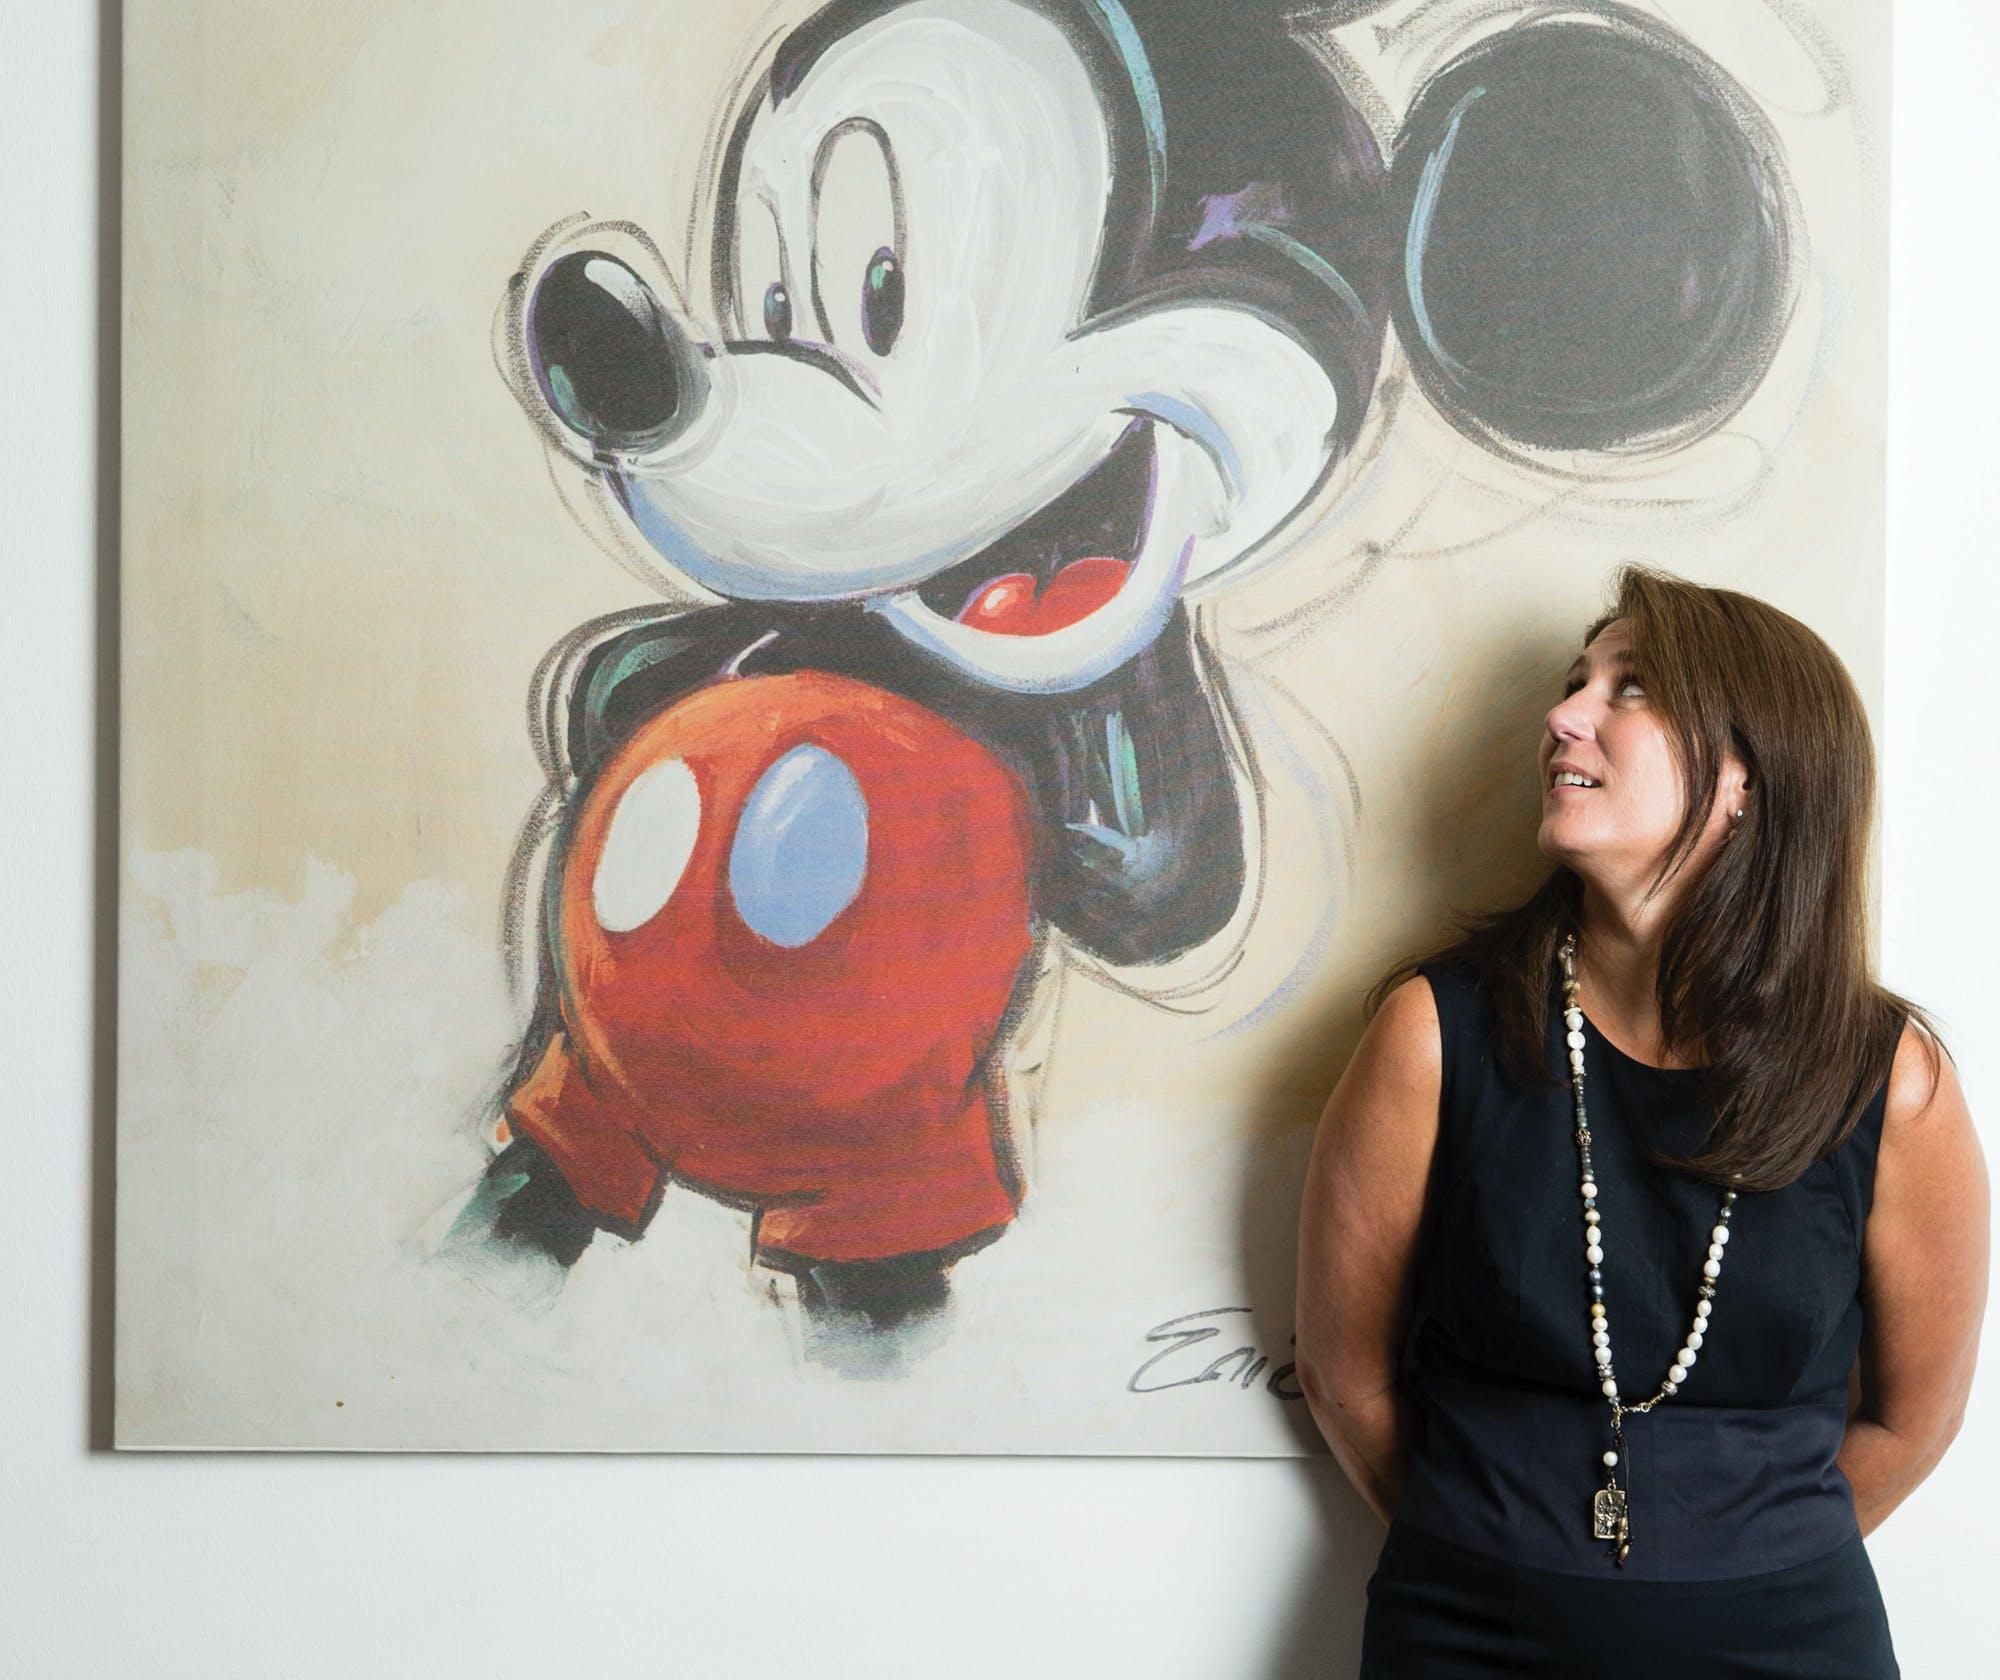 Tricia-Wilber-Disney-2013-fullwidth